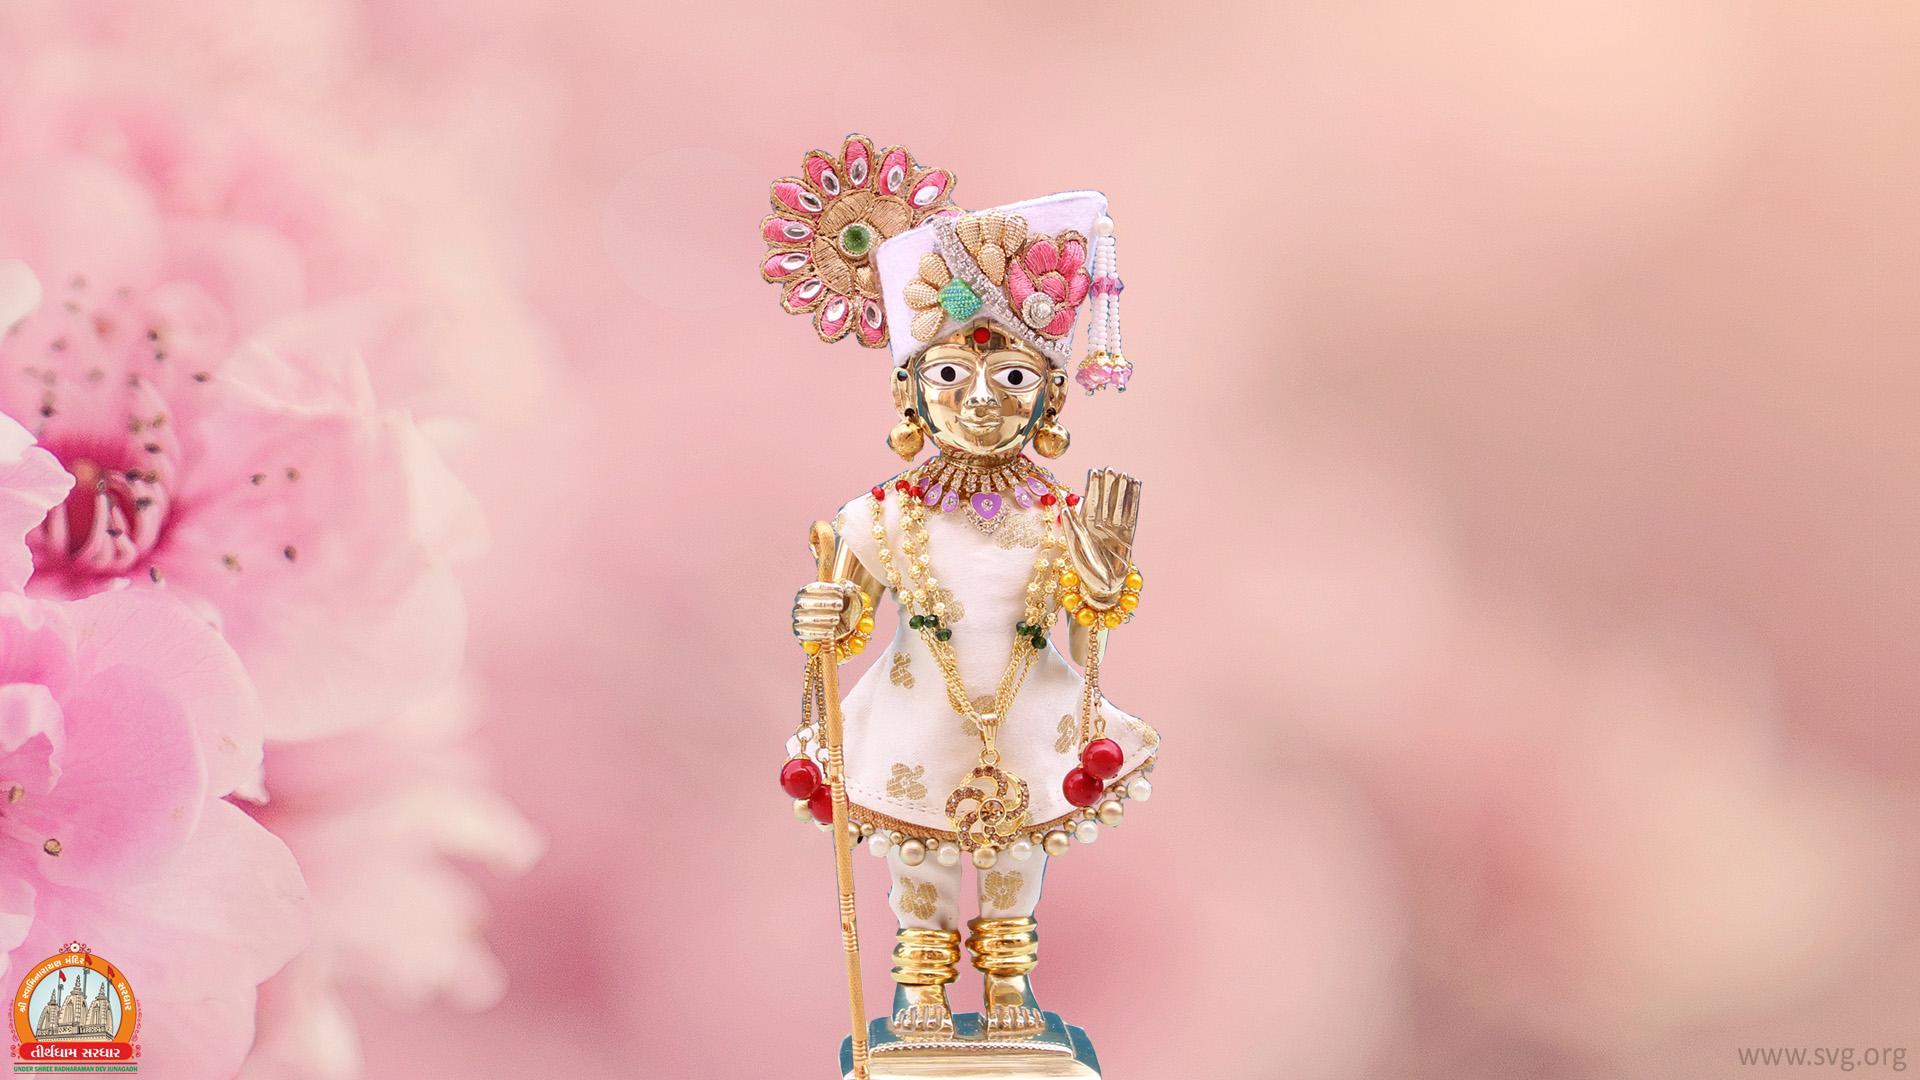 Swaminarayan - Desktop - Wallpaper